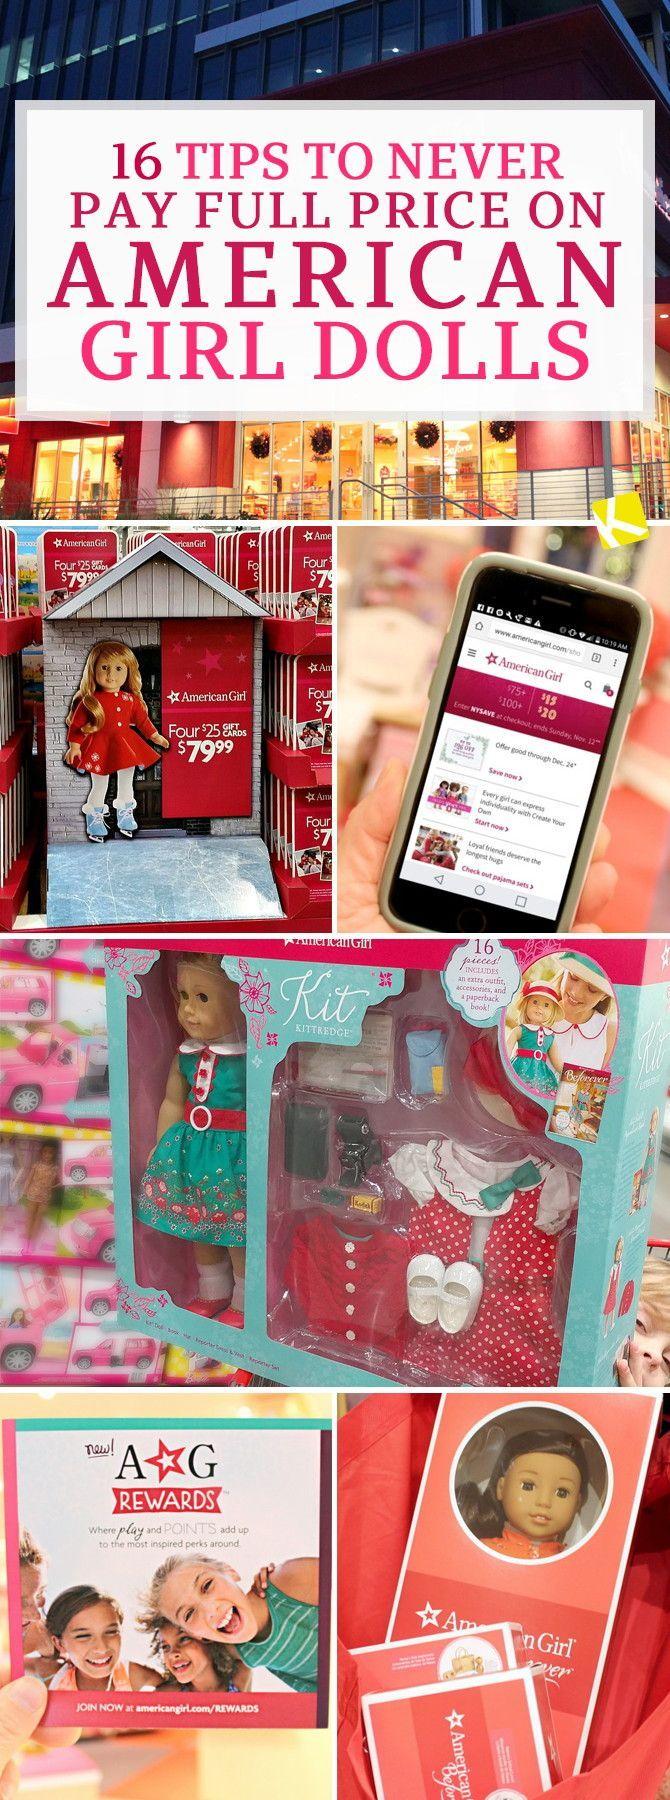 Save money on American Girl Dolls!!!